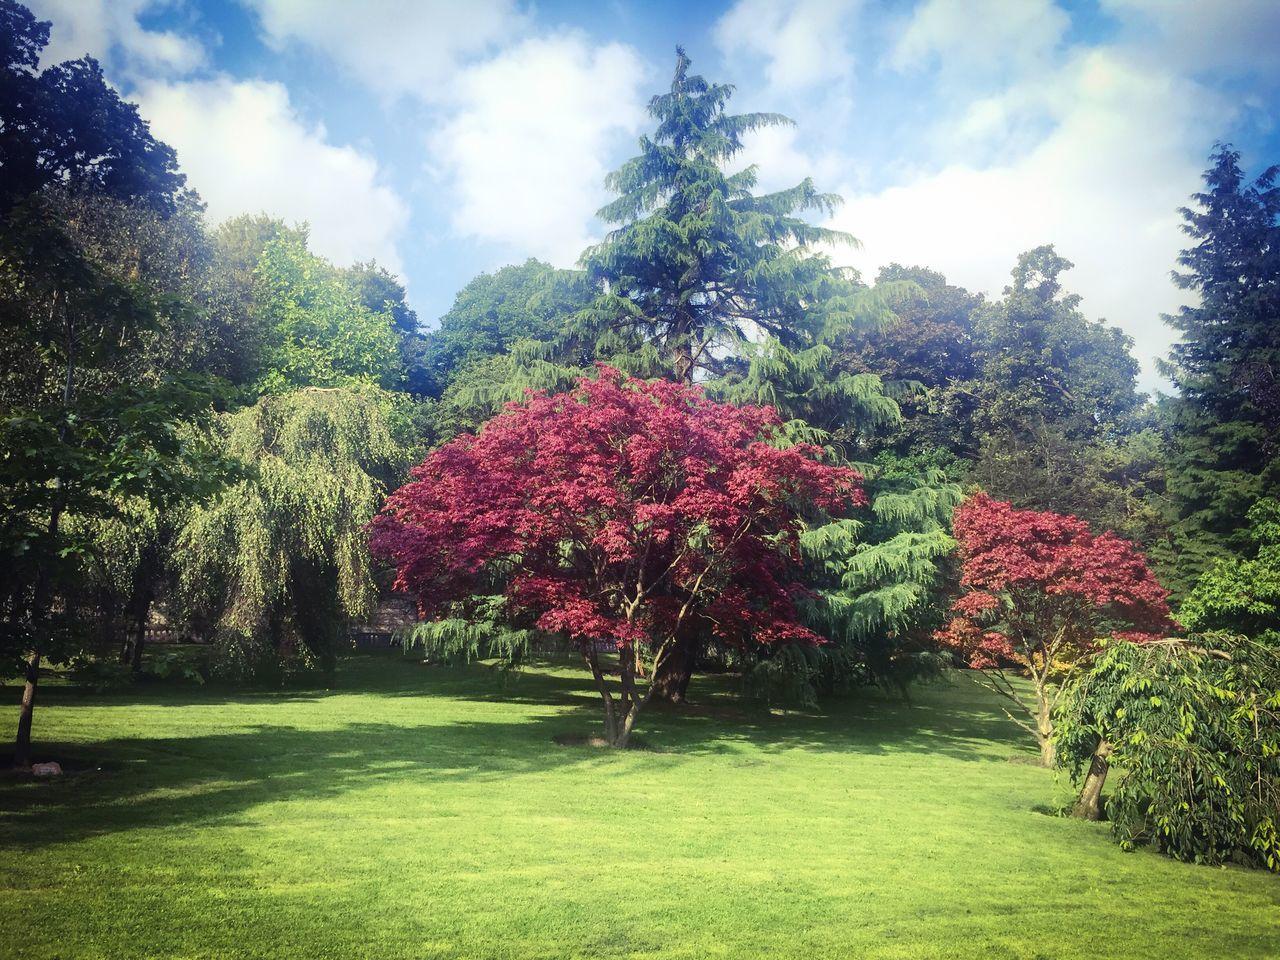 Tree Landscape Summer #summertime #sun #TagsForLikes.com #hot #sunny #warm #fun #beautiful #sky #clearskys #season #seasons #instagood #instasummer #photooftheday #nature #TFLers #clearsky #bluesky #vacationtime #weather #summerweather #sunshine #summertimeshine